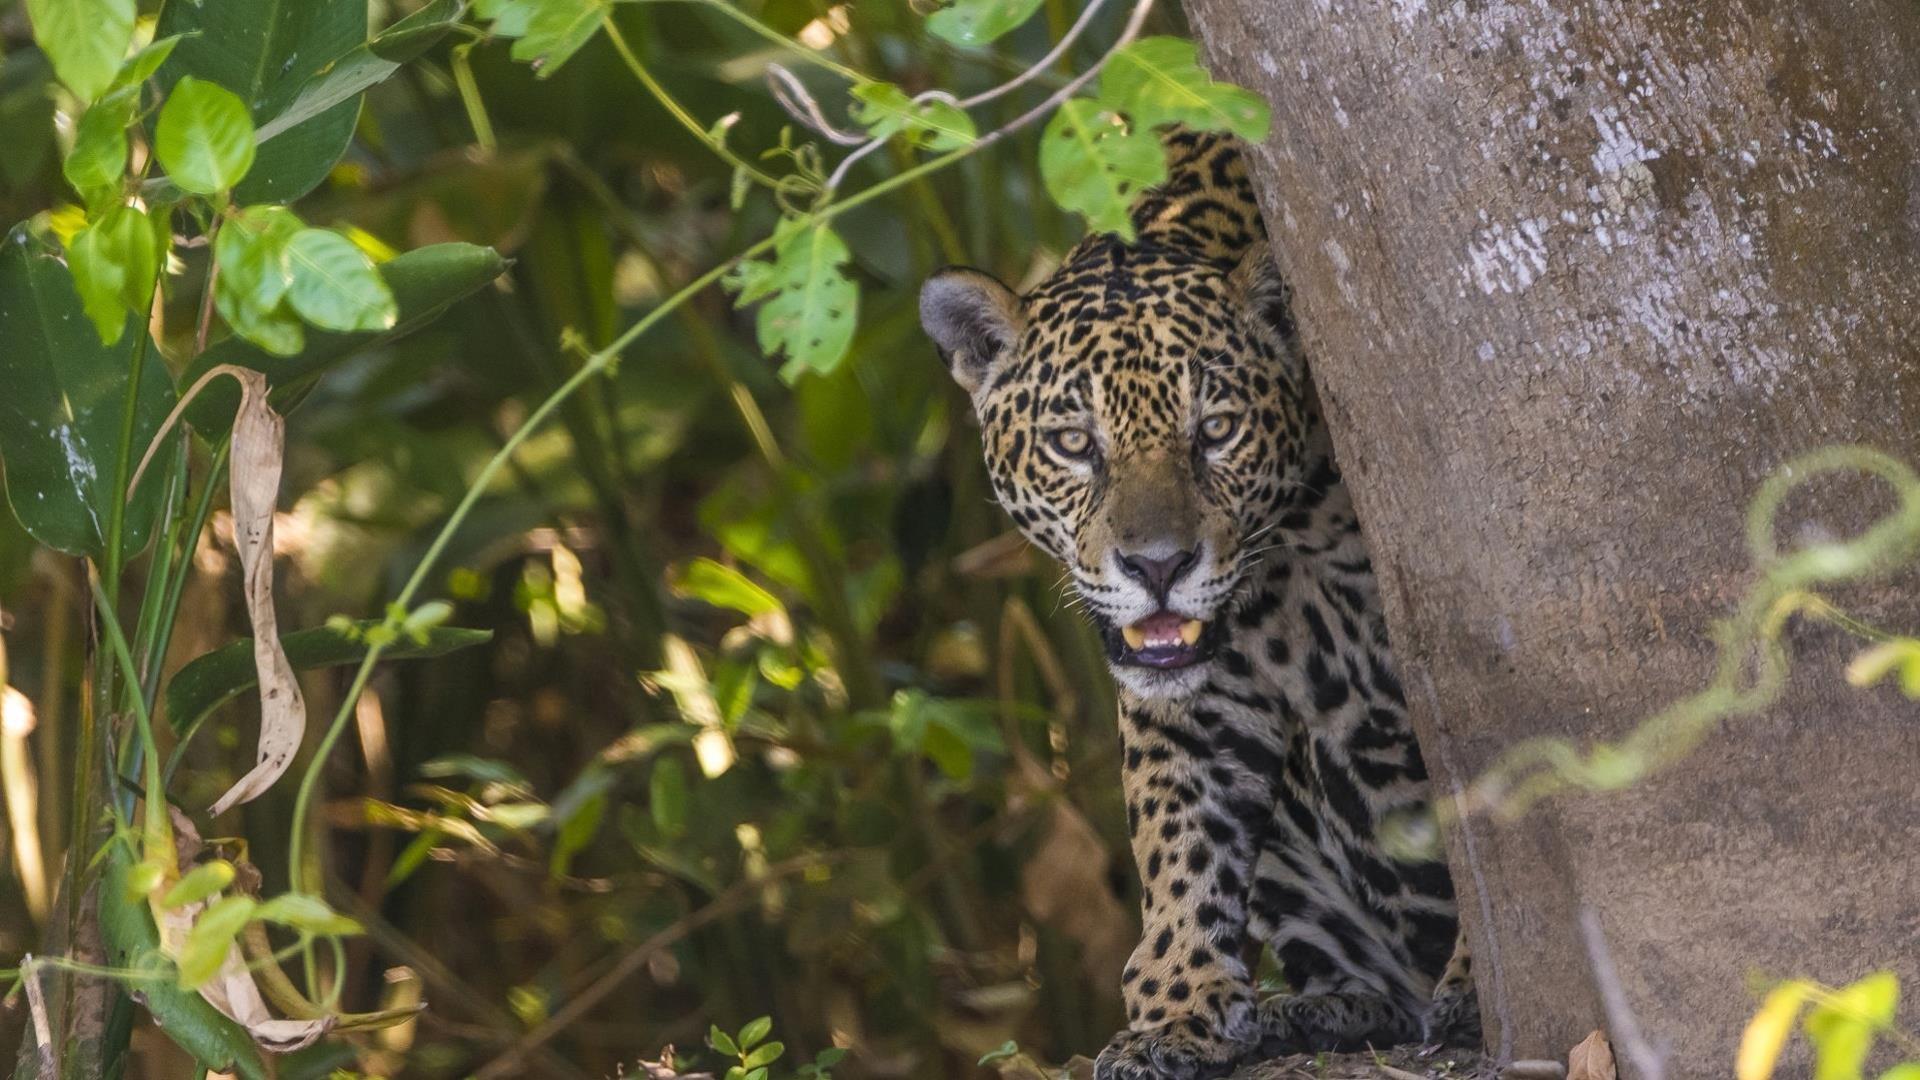 Brasilien Nord Pantanal: 6 Tage Reisebaustein -  Jaguar Safari mit Übernachtung im Flotel